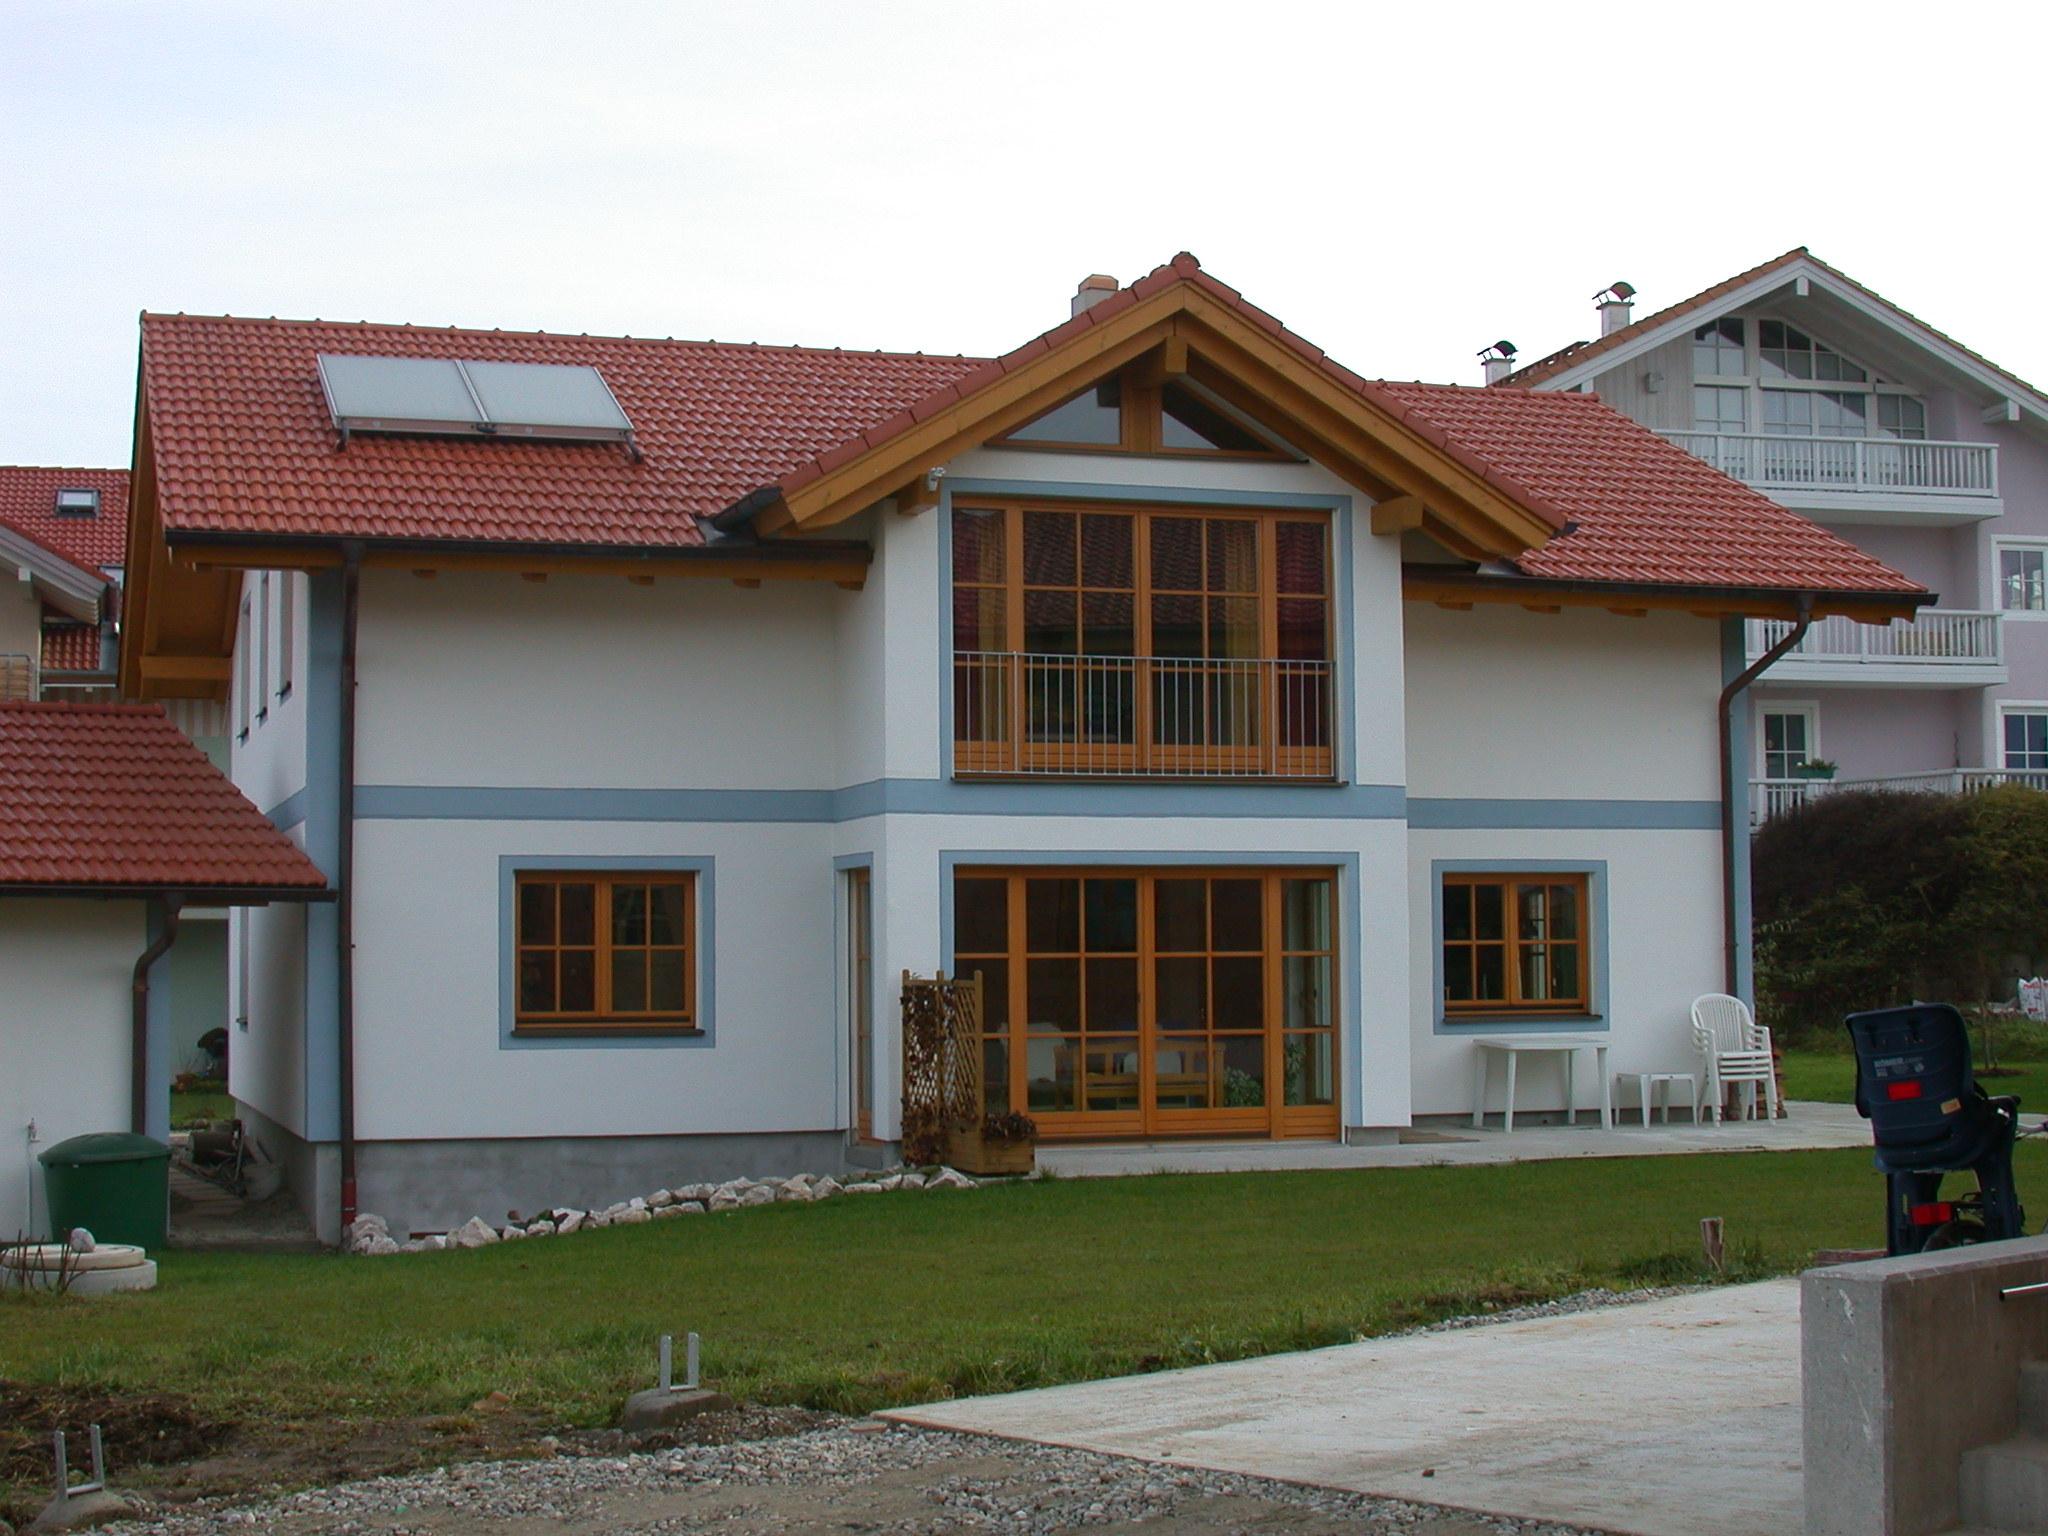 Einfamilienhaus, Bad Endorf, BJ 2003